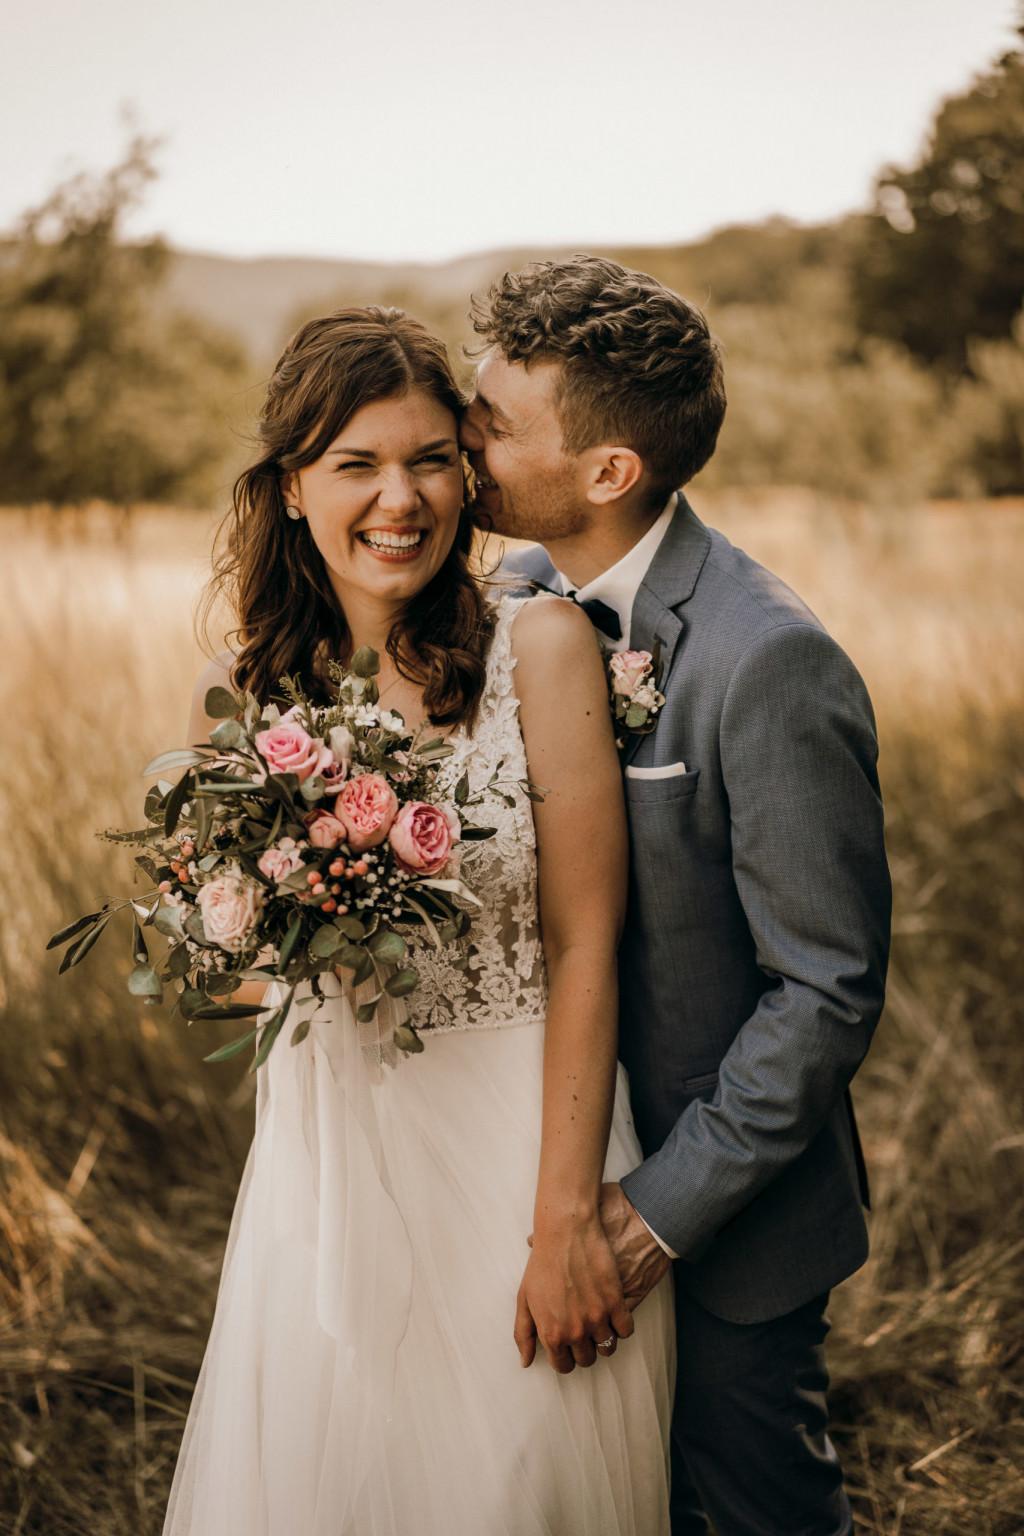 tiny wedding boho hochzeit | Karina Sowa Wedding Photography-4